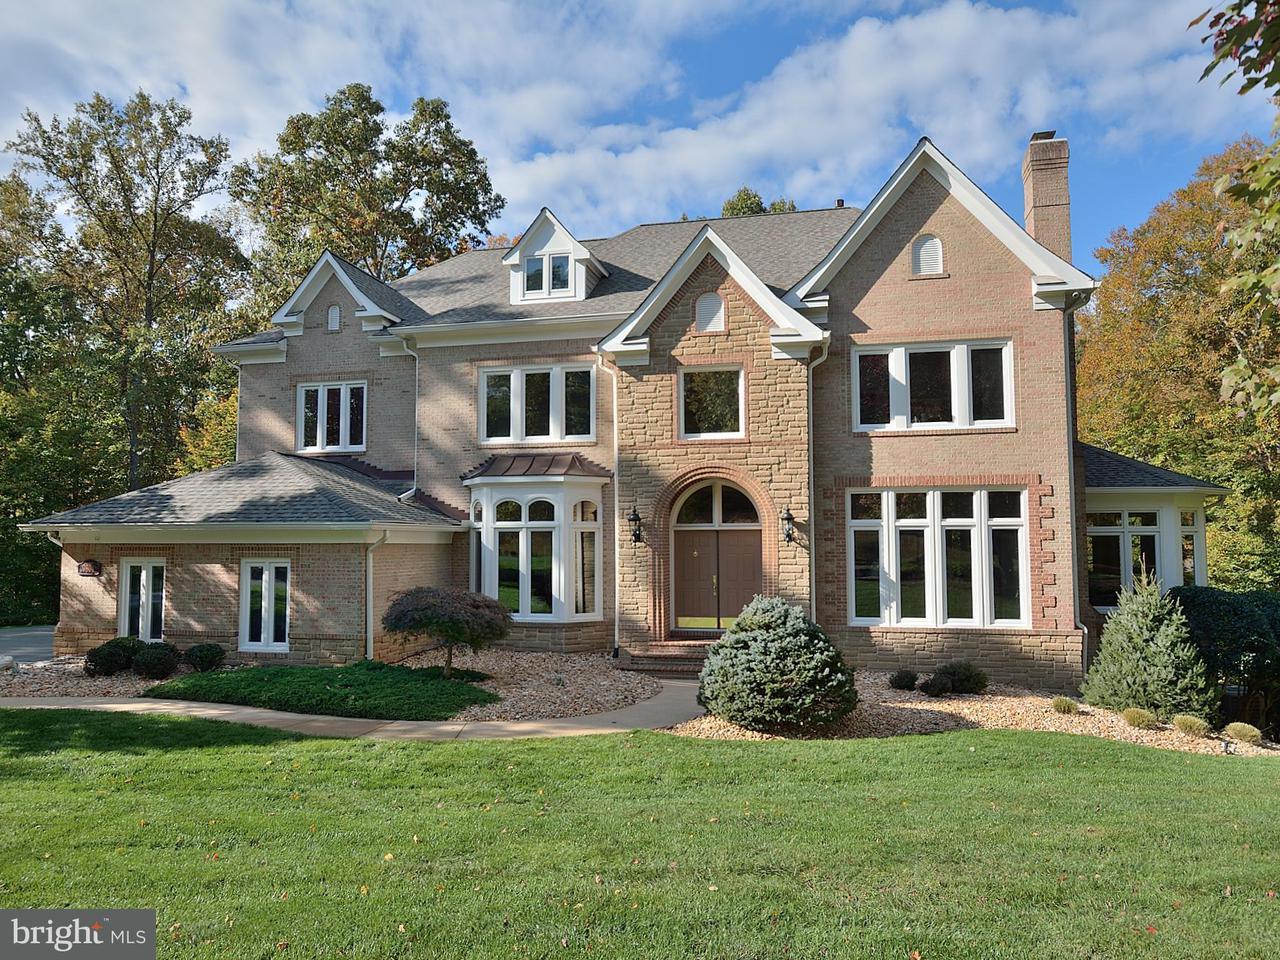 獨棟家庭住宅 為 出售 在 9804 Thorn Bush Drive 9804 Thorn Bush Drive Fairfax Station, 弗吉尼亞州 22039 美國